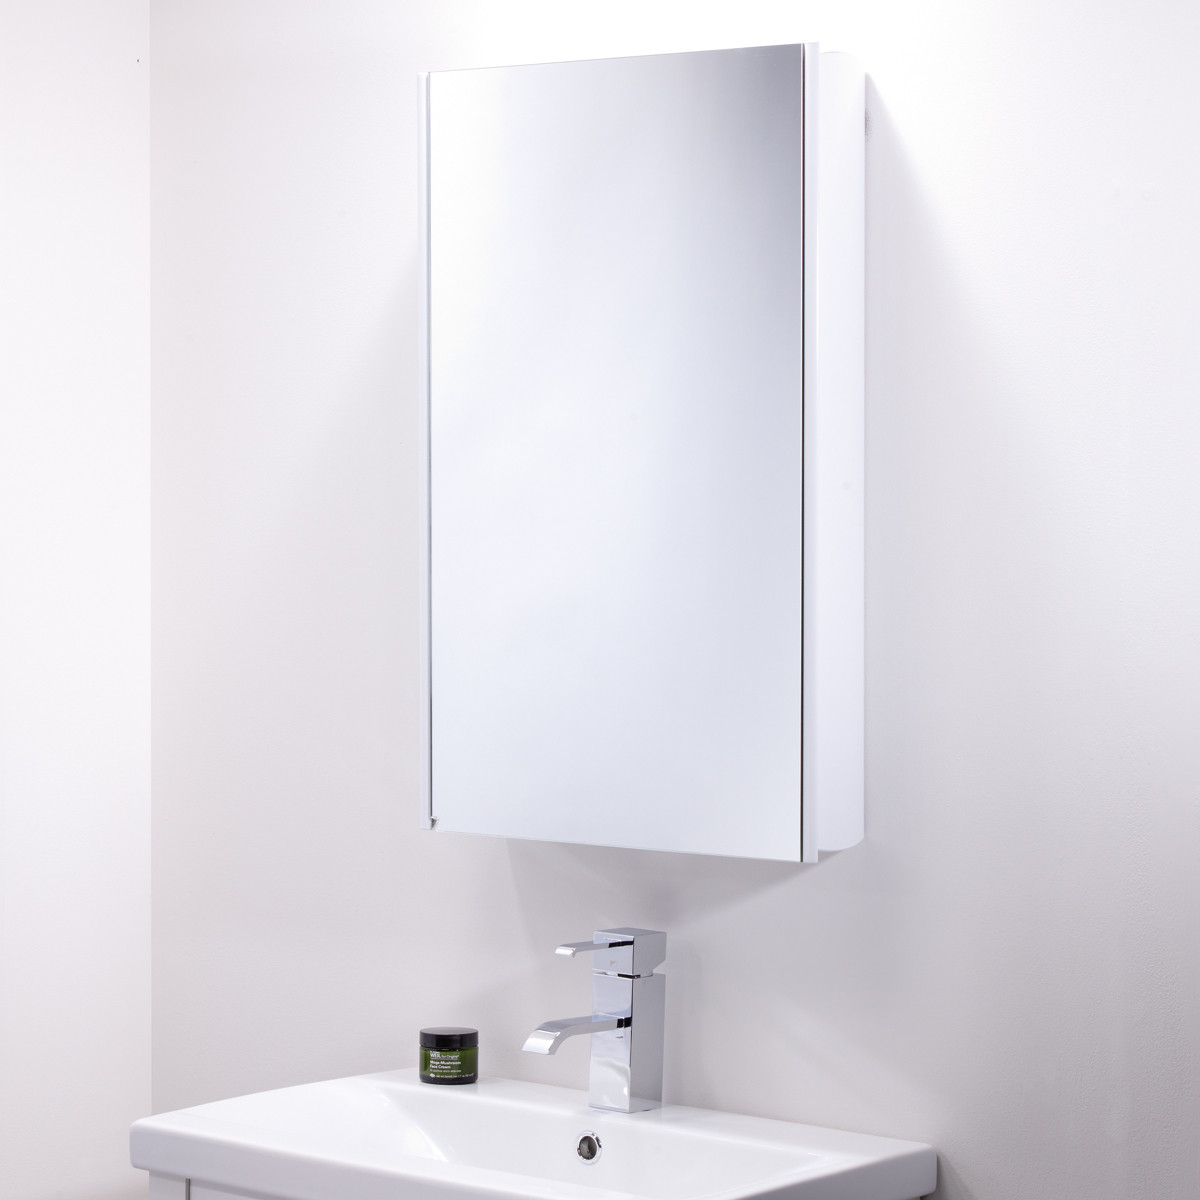 roper rhodes limit bathroom cabinet white finish as415w rh showerstoyou co uk Kohler Bathroom Cabinets Kohler Bathroom Cabinets